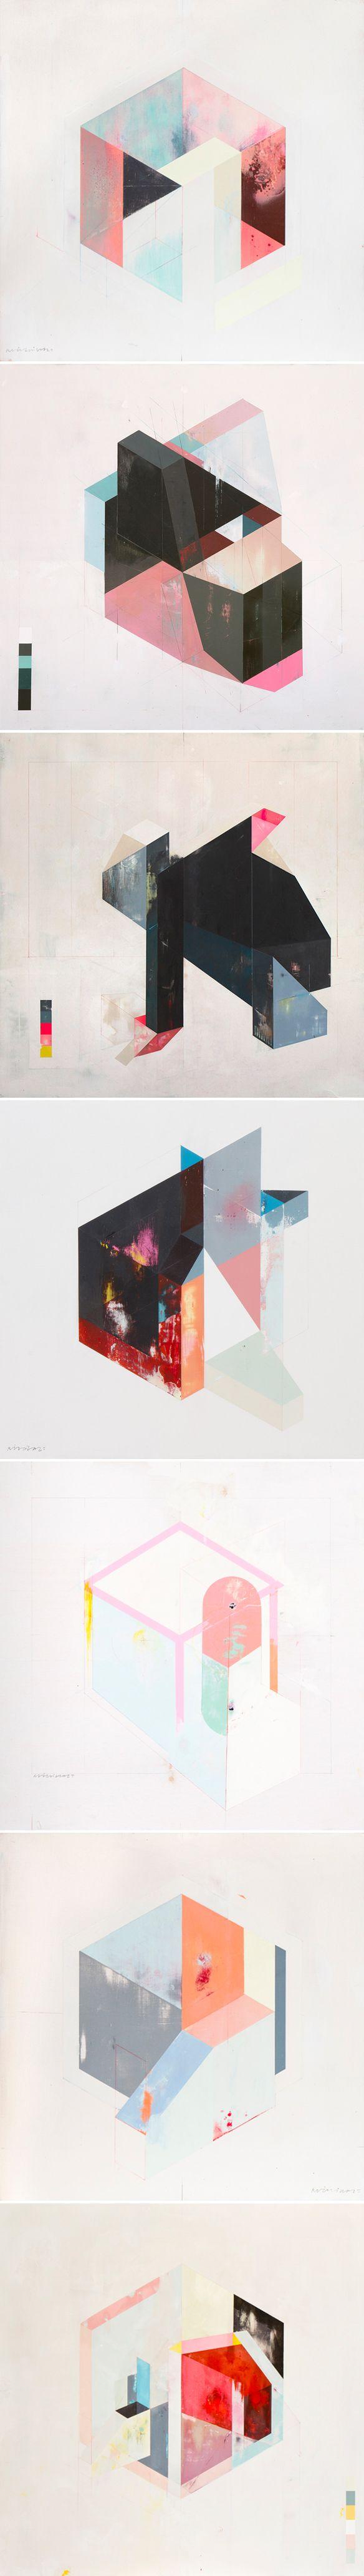 albert ruiz villar | geometric